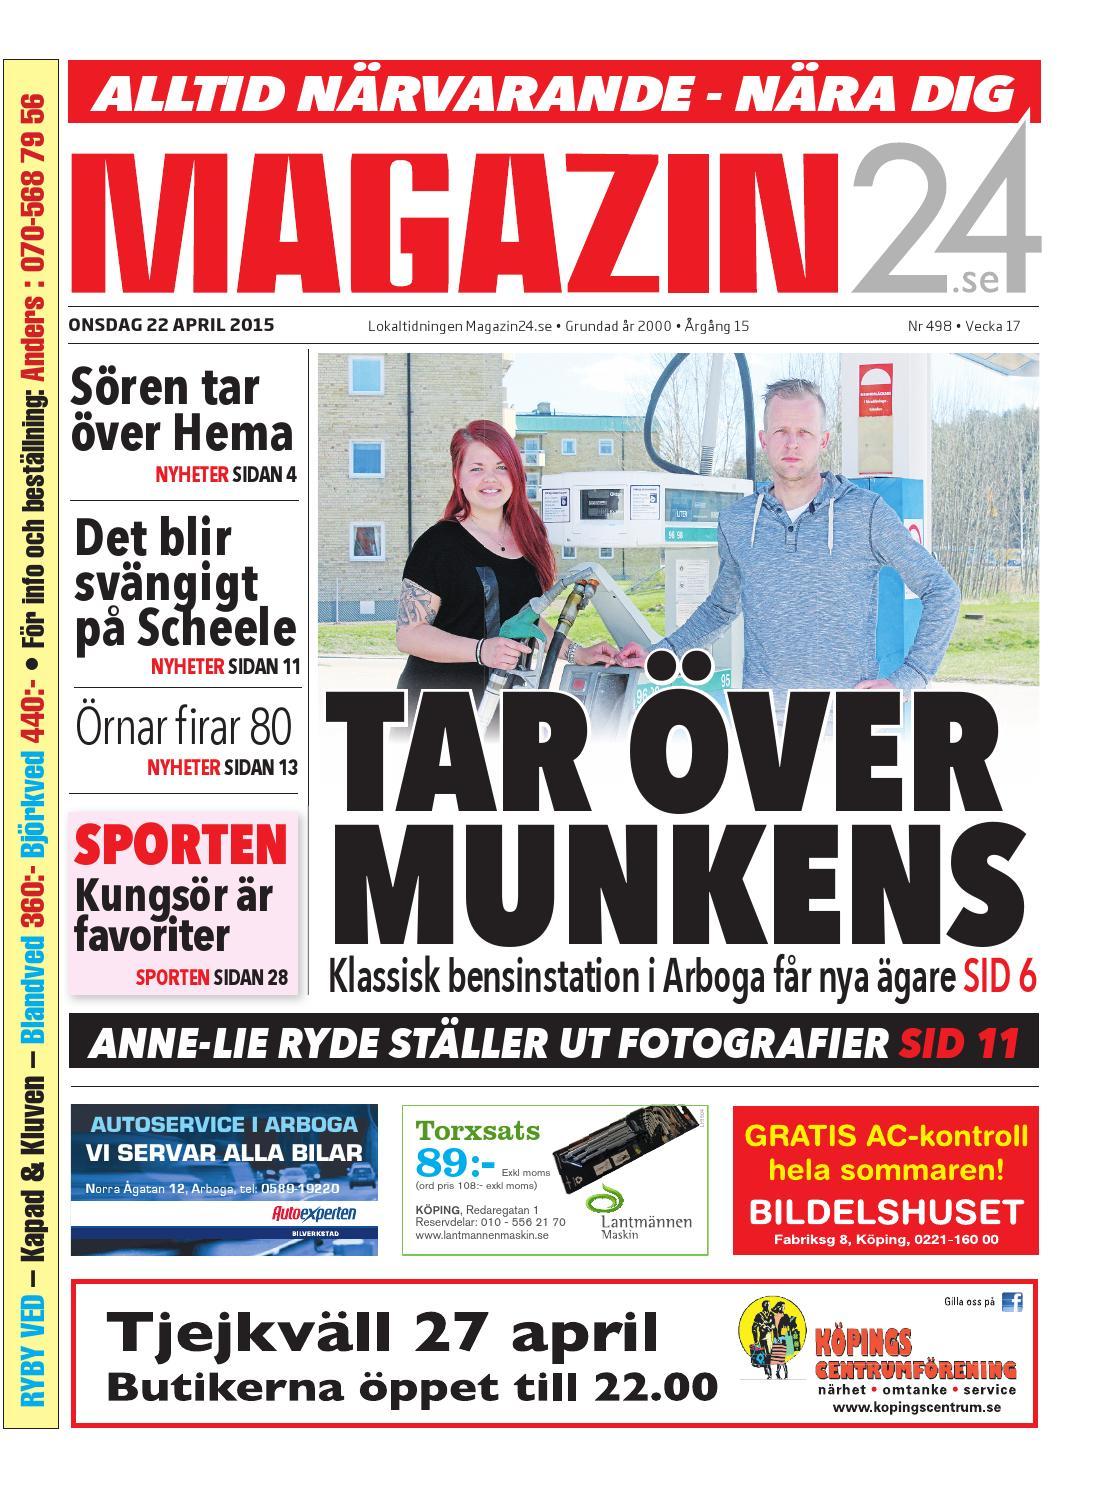 magazin24